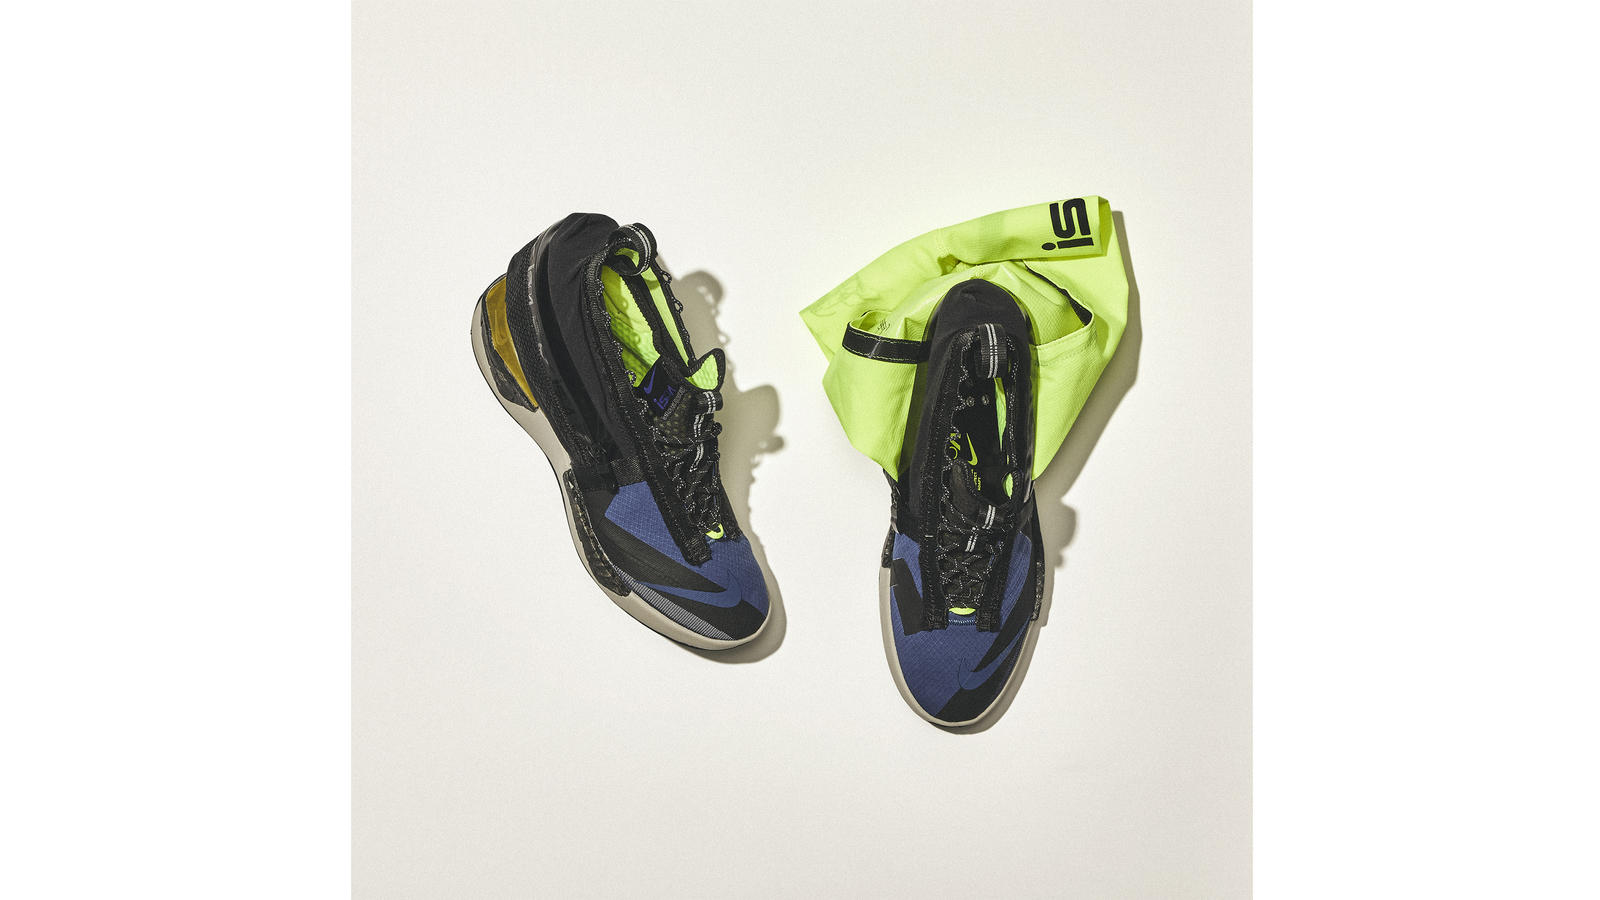 Nike ISPA Drifter Gator 18